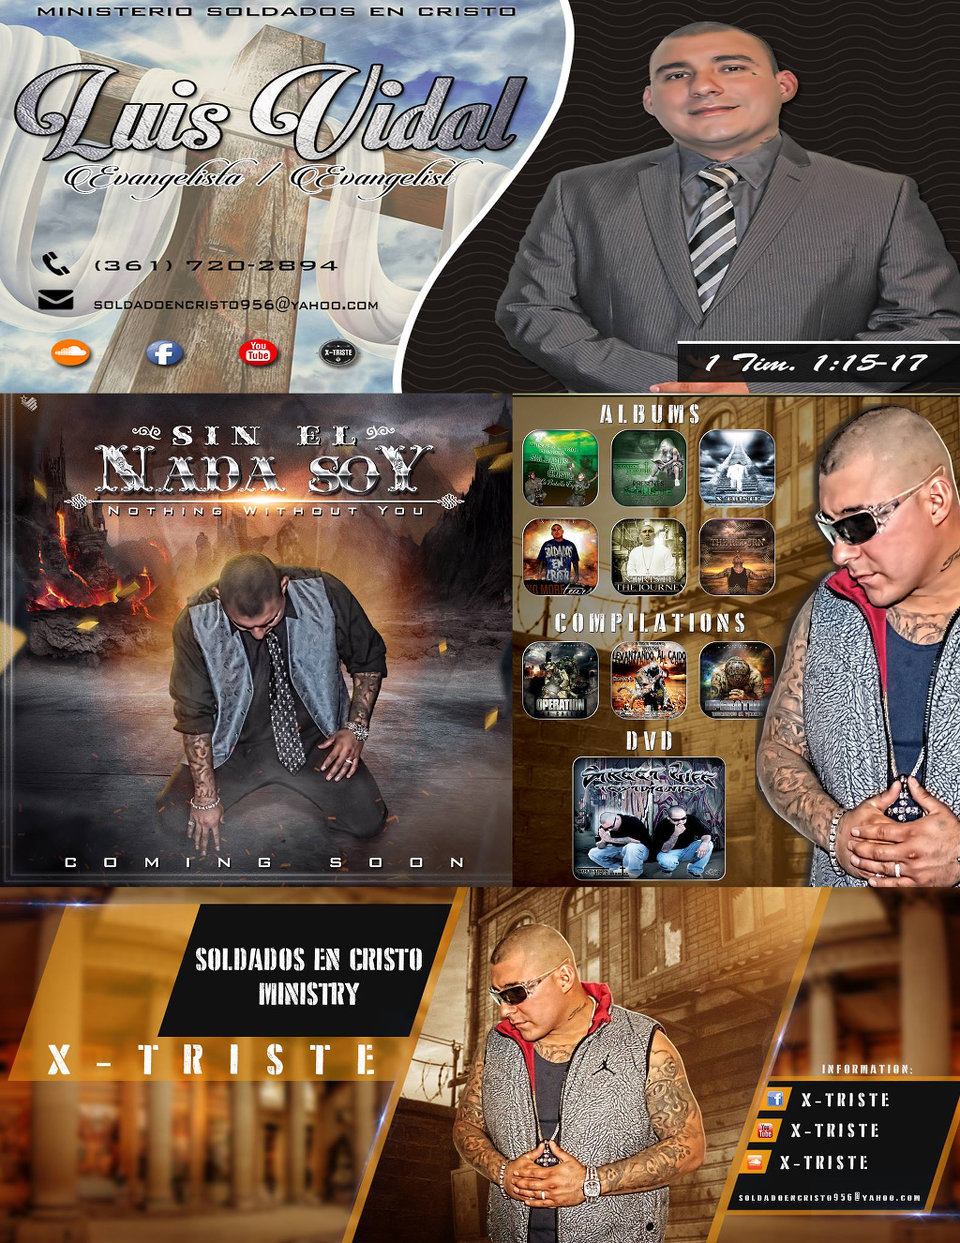 X-Triste-ministry-ad-2.jpg